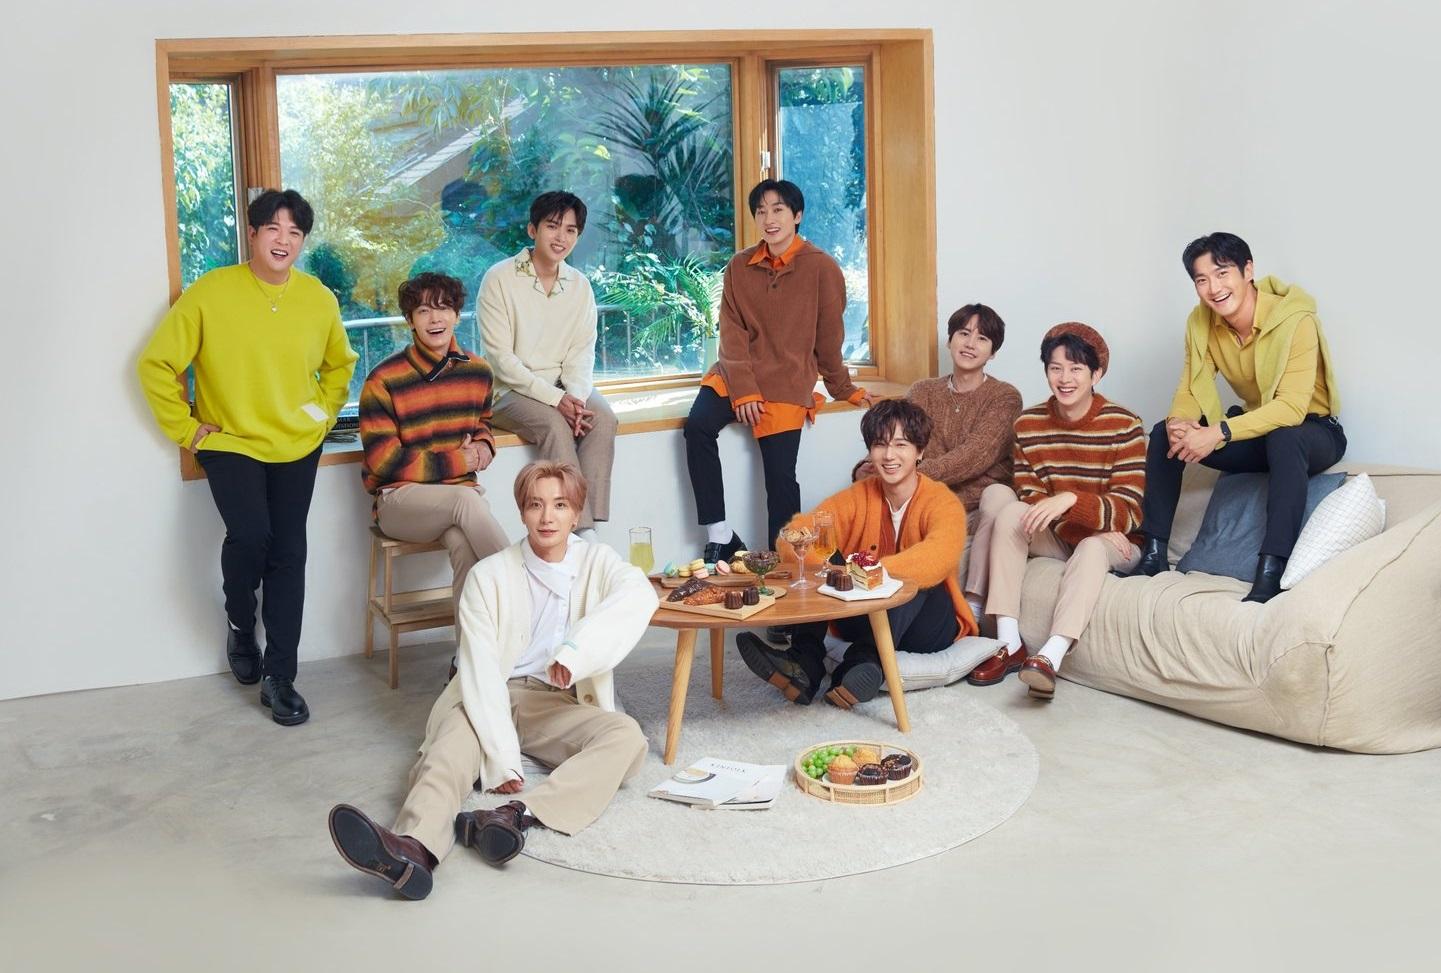 super-junior-to-make-comeback-with-10th-full-length-album-in-december-2